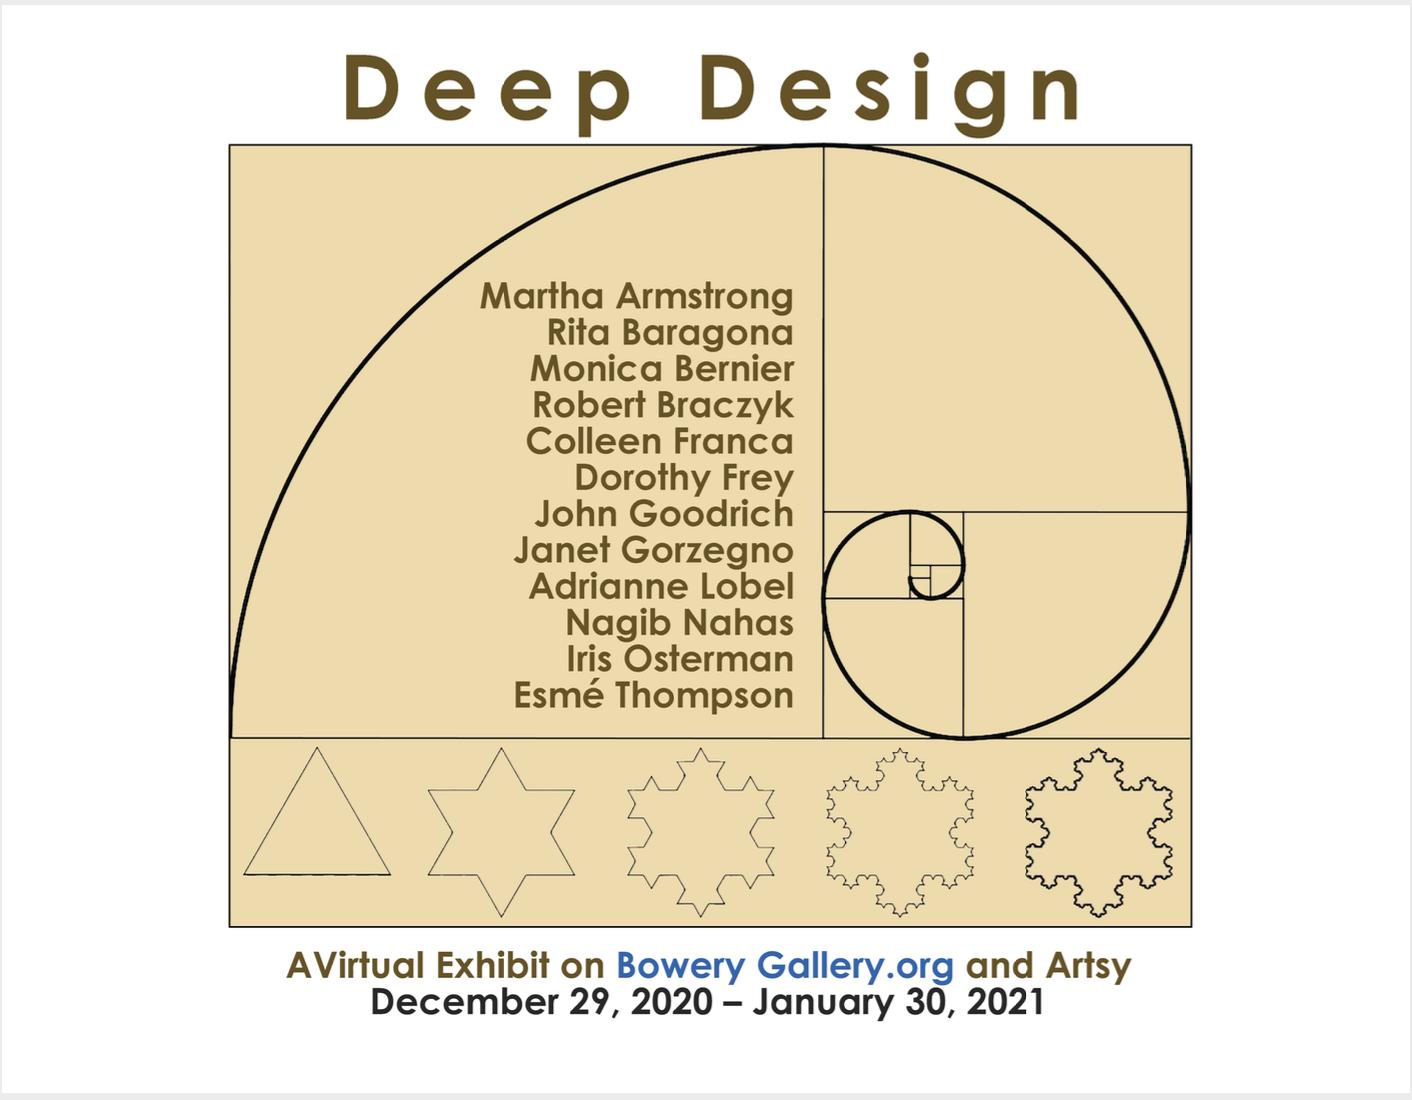 DeepDesignCard.png